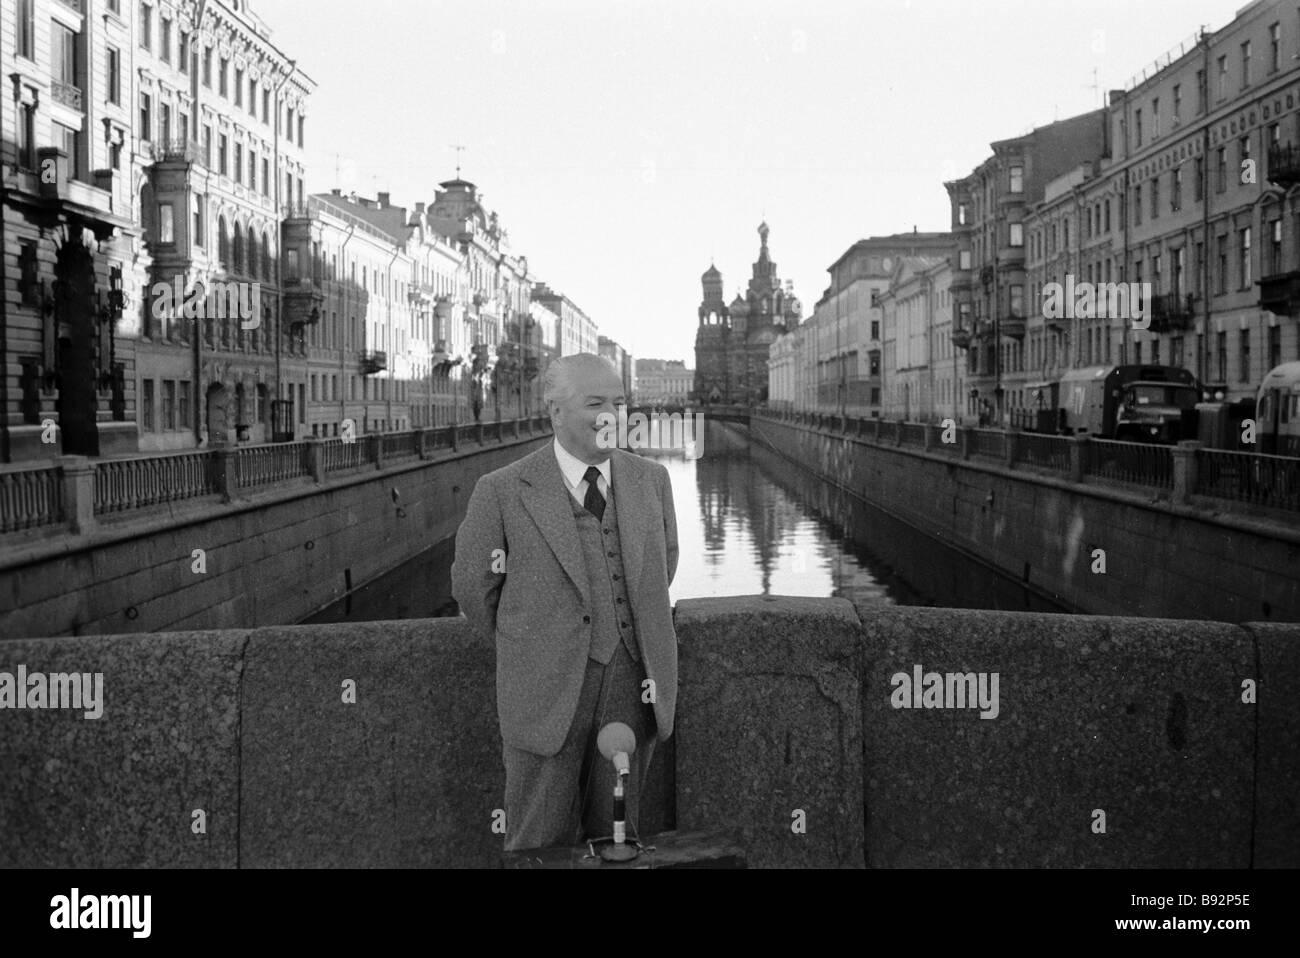 Theorist of literature Irakly Andronikov in a Leningrad street - Stock Image